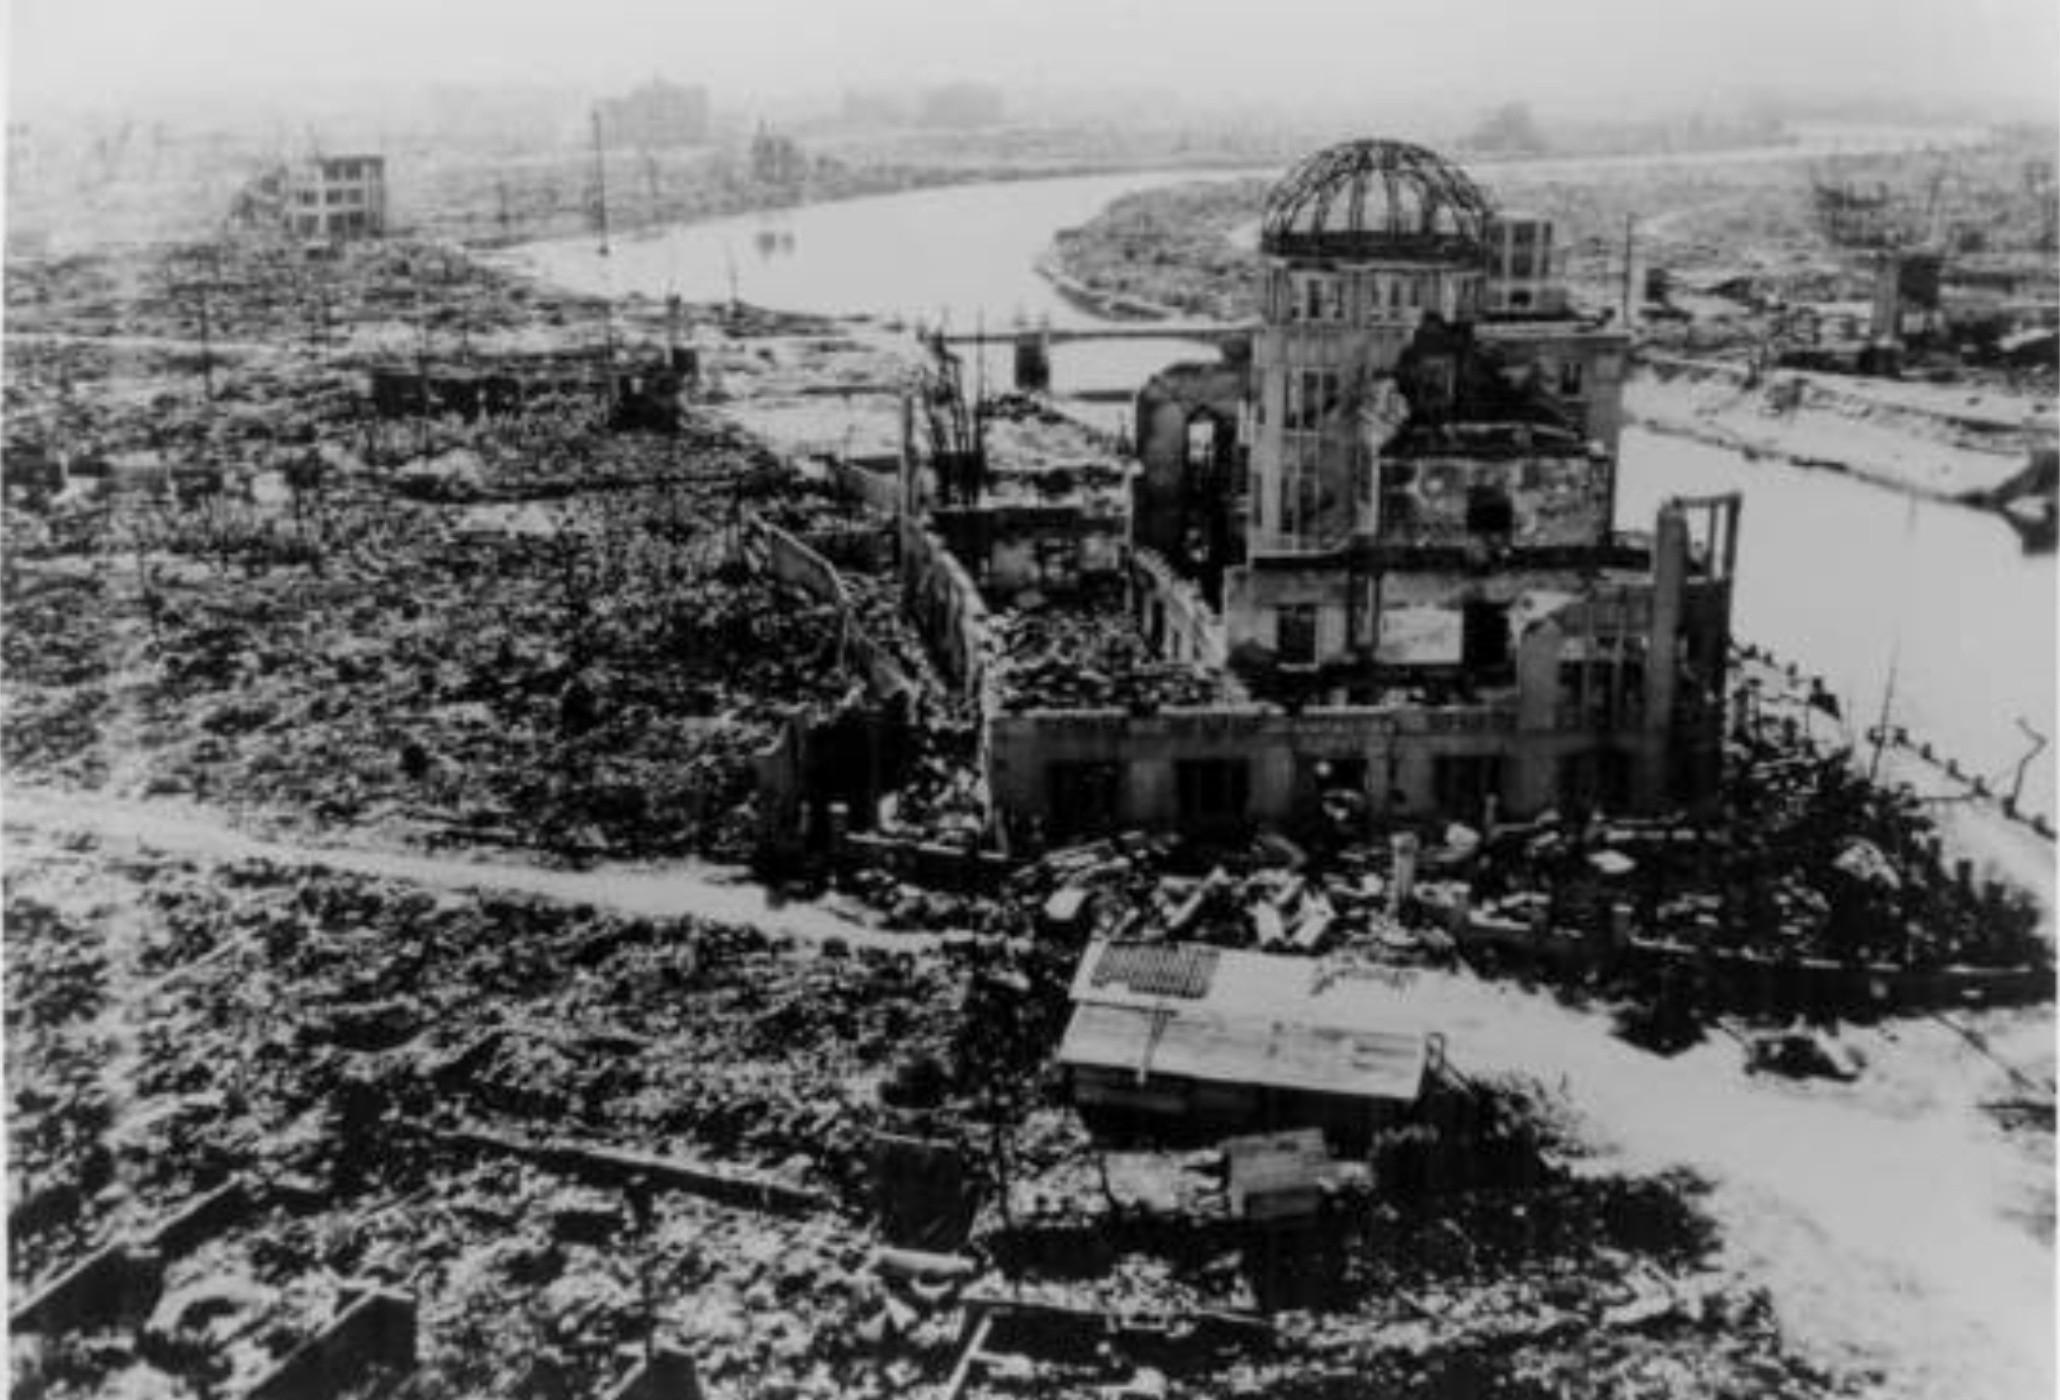 Hiroshima_after_the_atomic_bombing